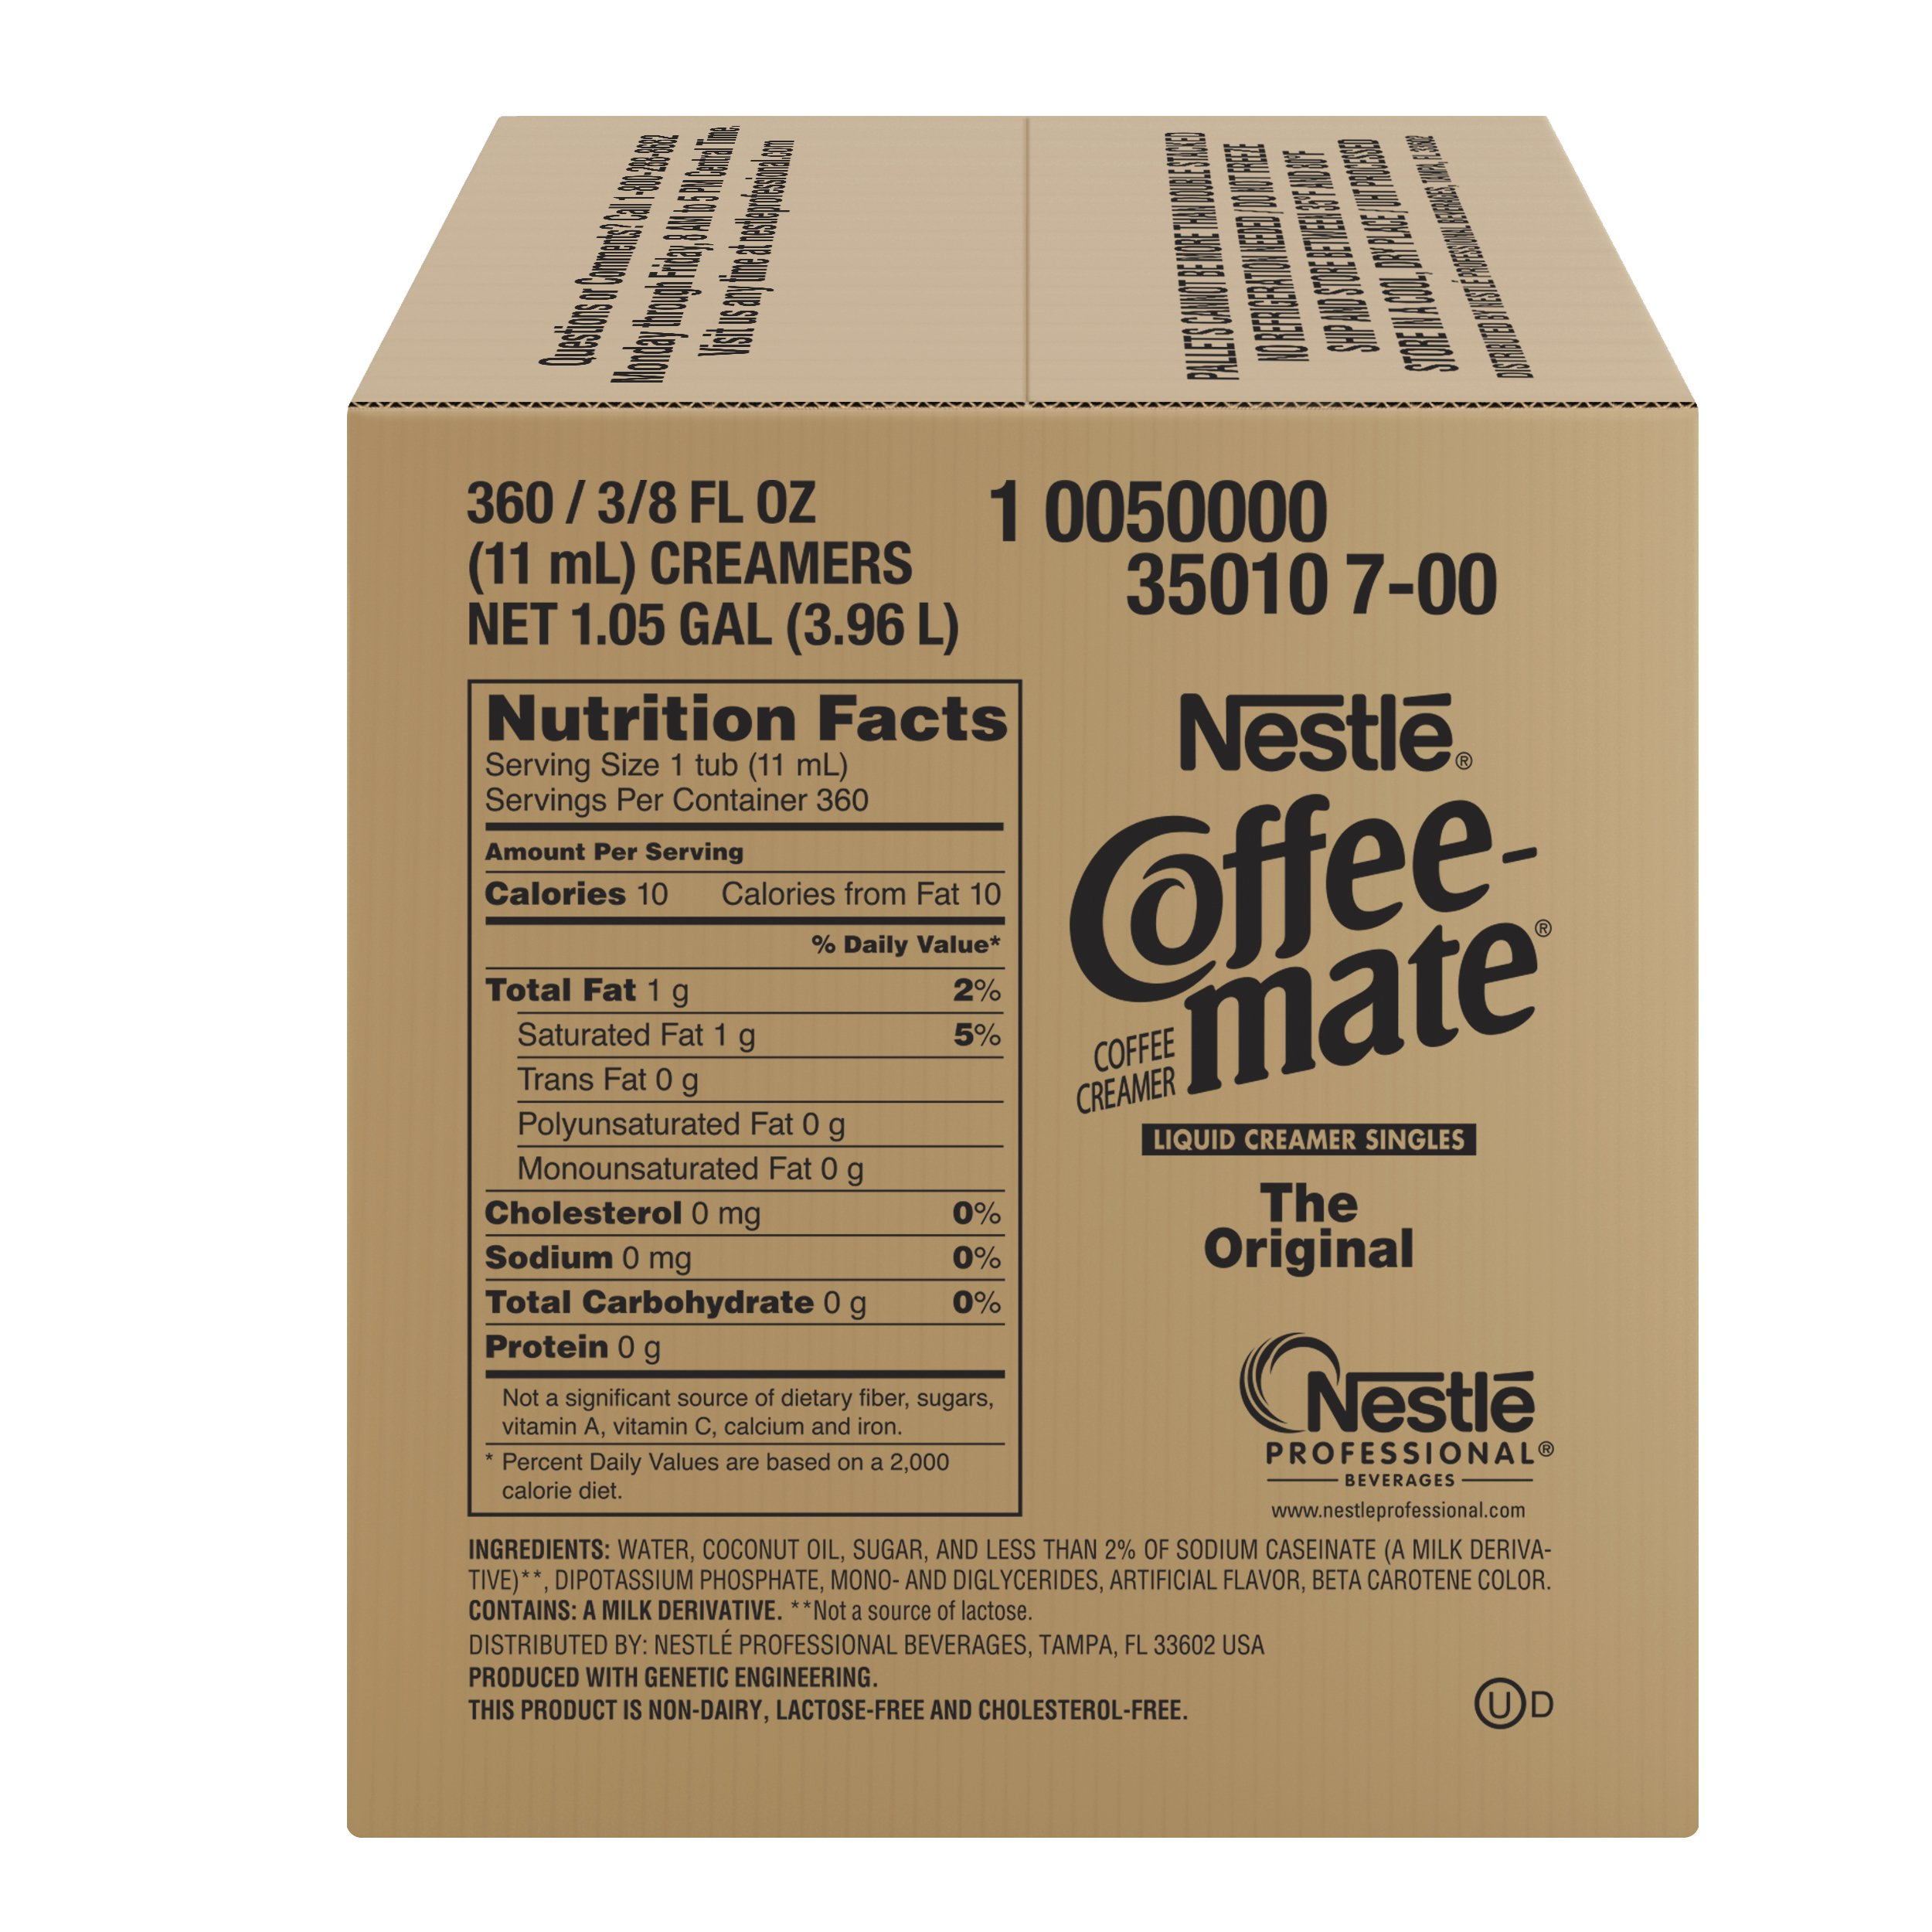 NESTLE COFFEE-MATE Coffee Creamer, Original, liquid creamer singles, 360 Count (Pack of 1) by Nestle Coffee Mate (Image #6)